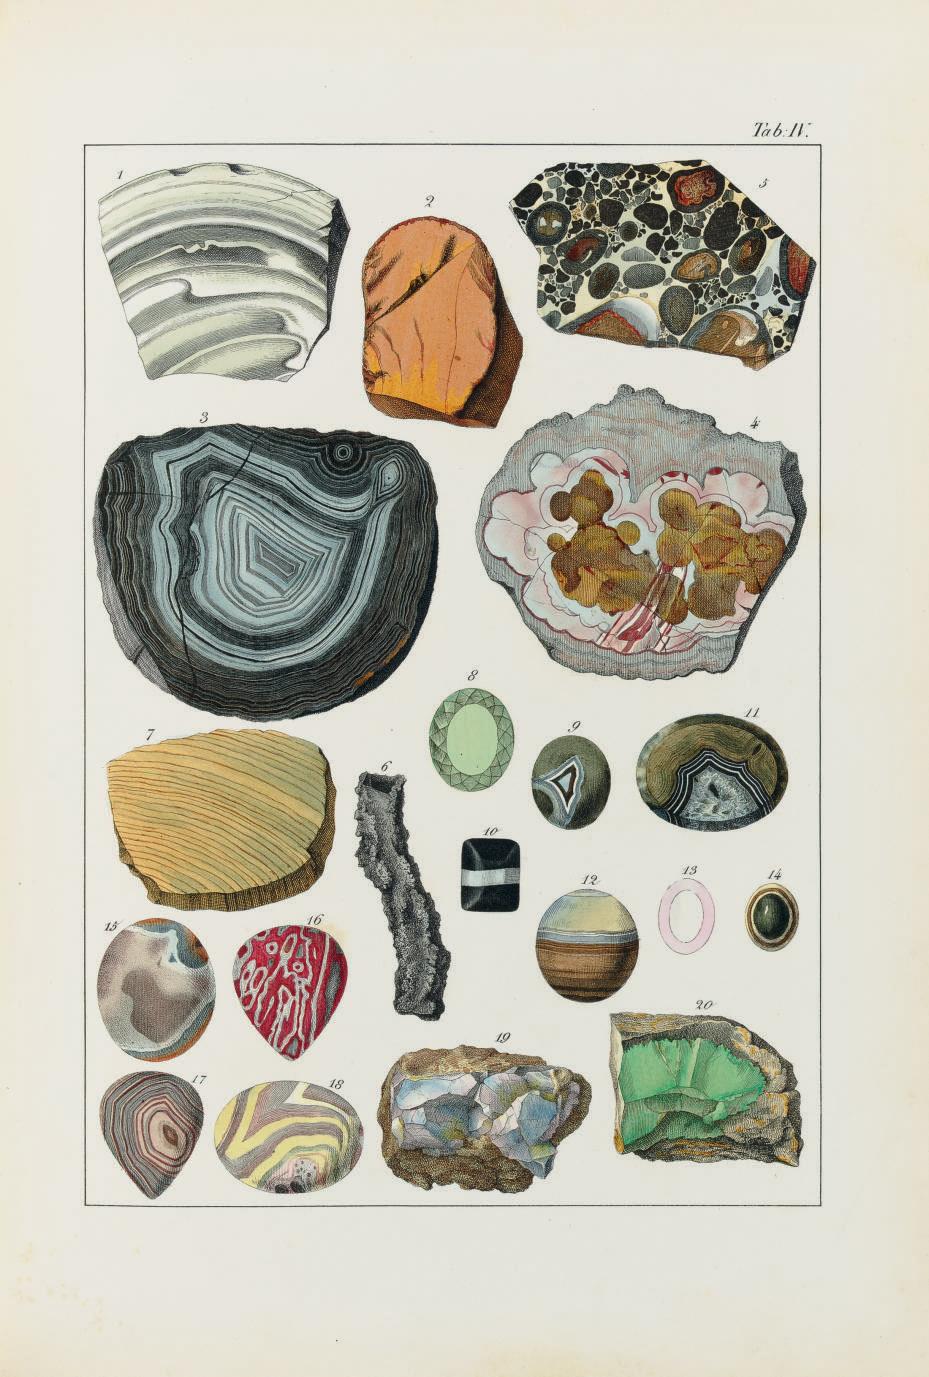 KURR, Johann Gottlob von (1798-1870). The Mineral Kingdom. Edinburgh: Edmonston and Douglas, 1859.